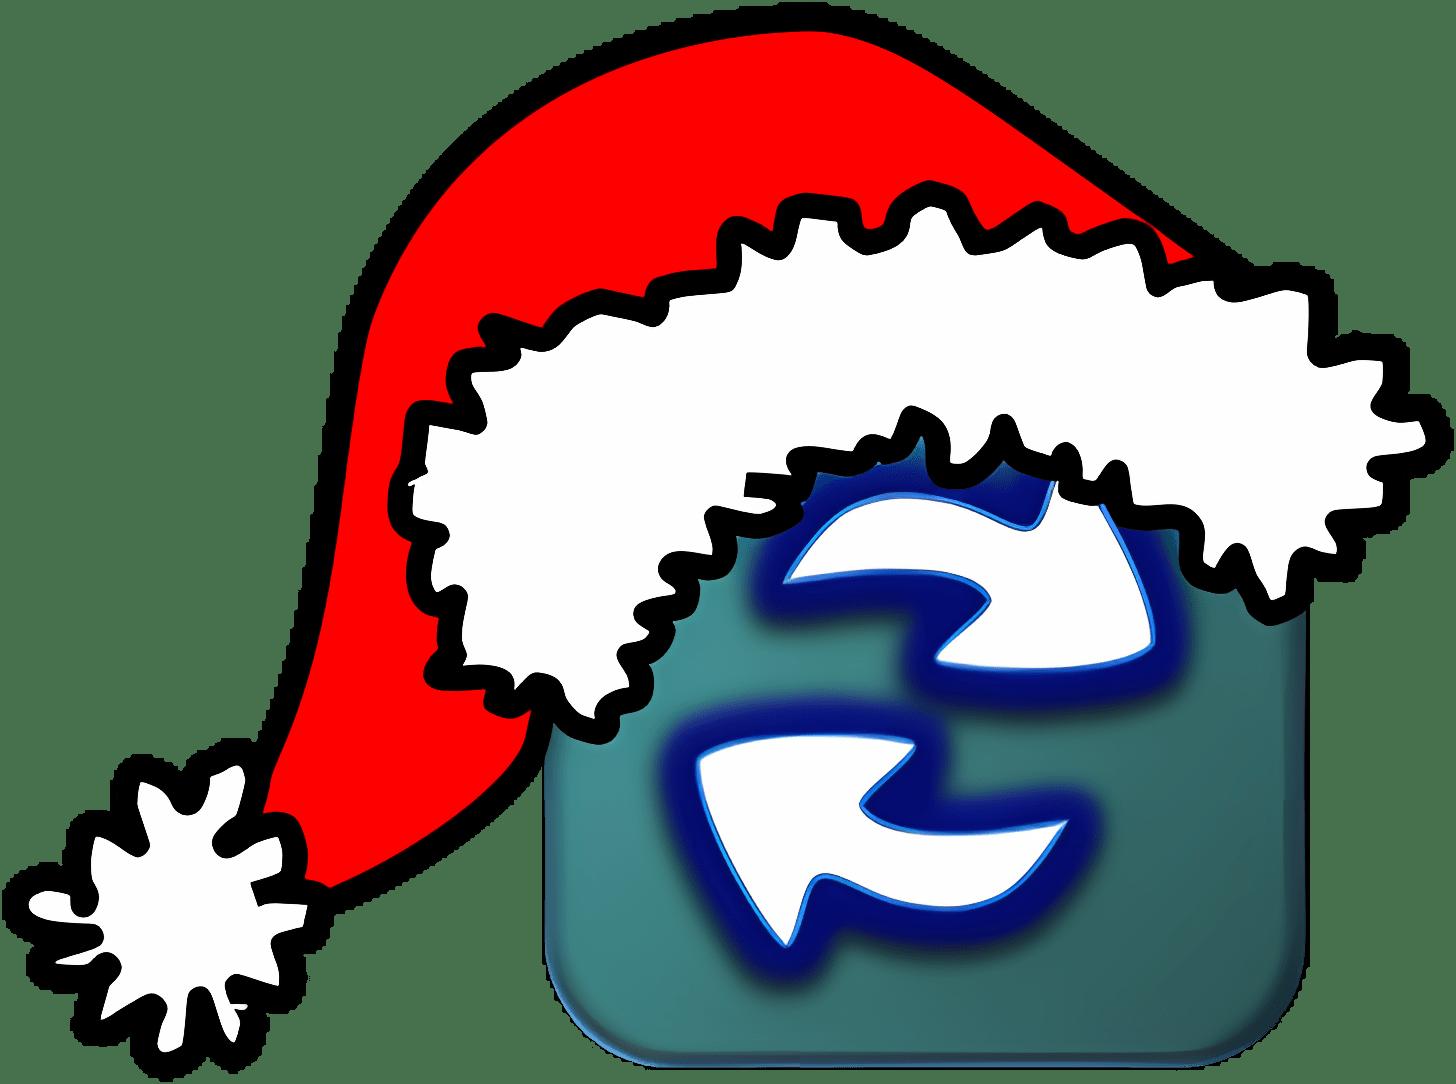 File Backupper (Portable Free Christmas Version) 2.4.7 (portable)